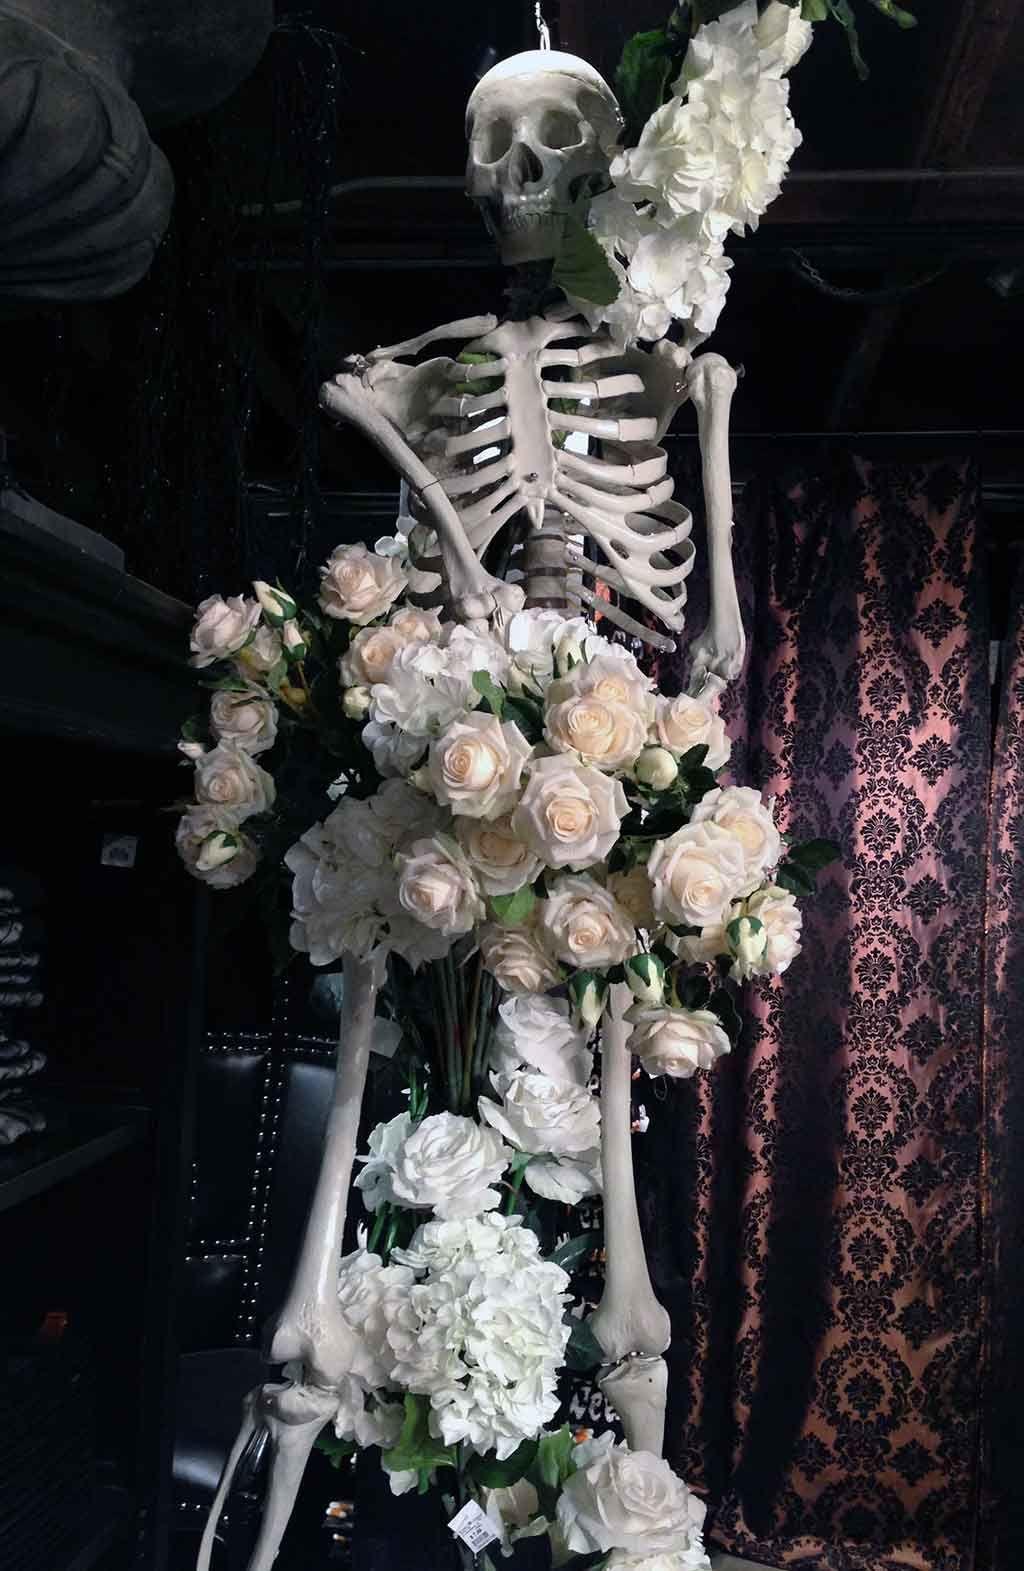 Behind the Curtain Hauntingly Beautiful Halloween 2014